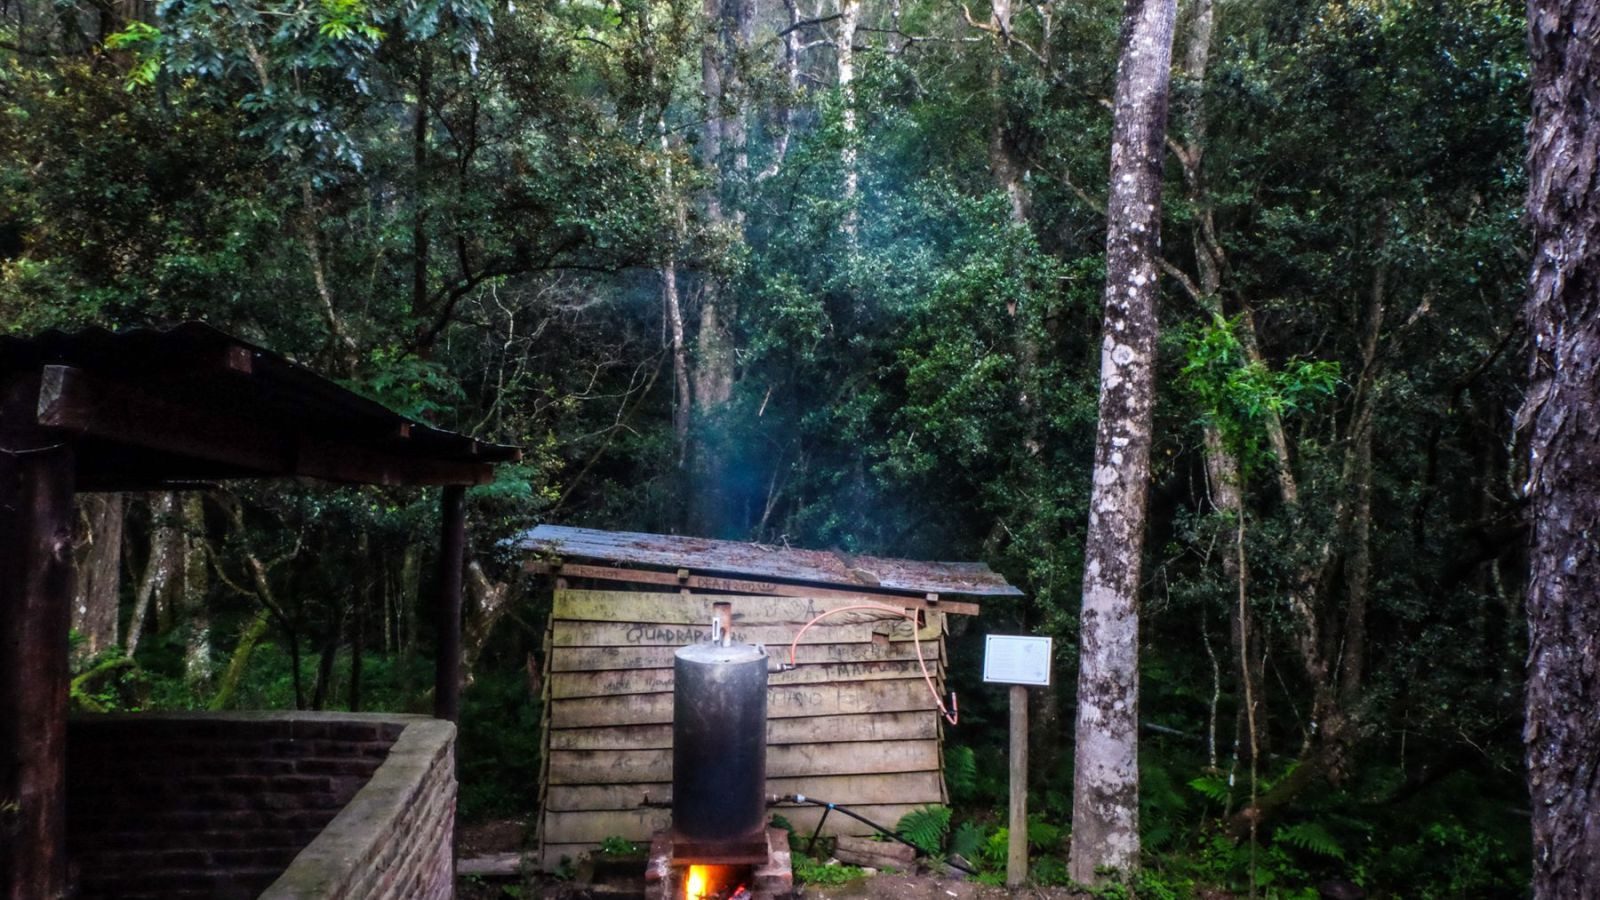 a photo of the donkey/shower at the third hut on the amathole hiking trail.